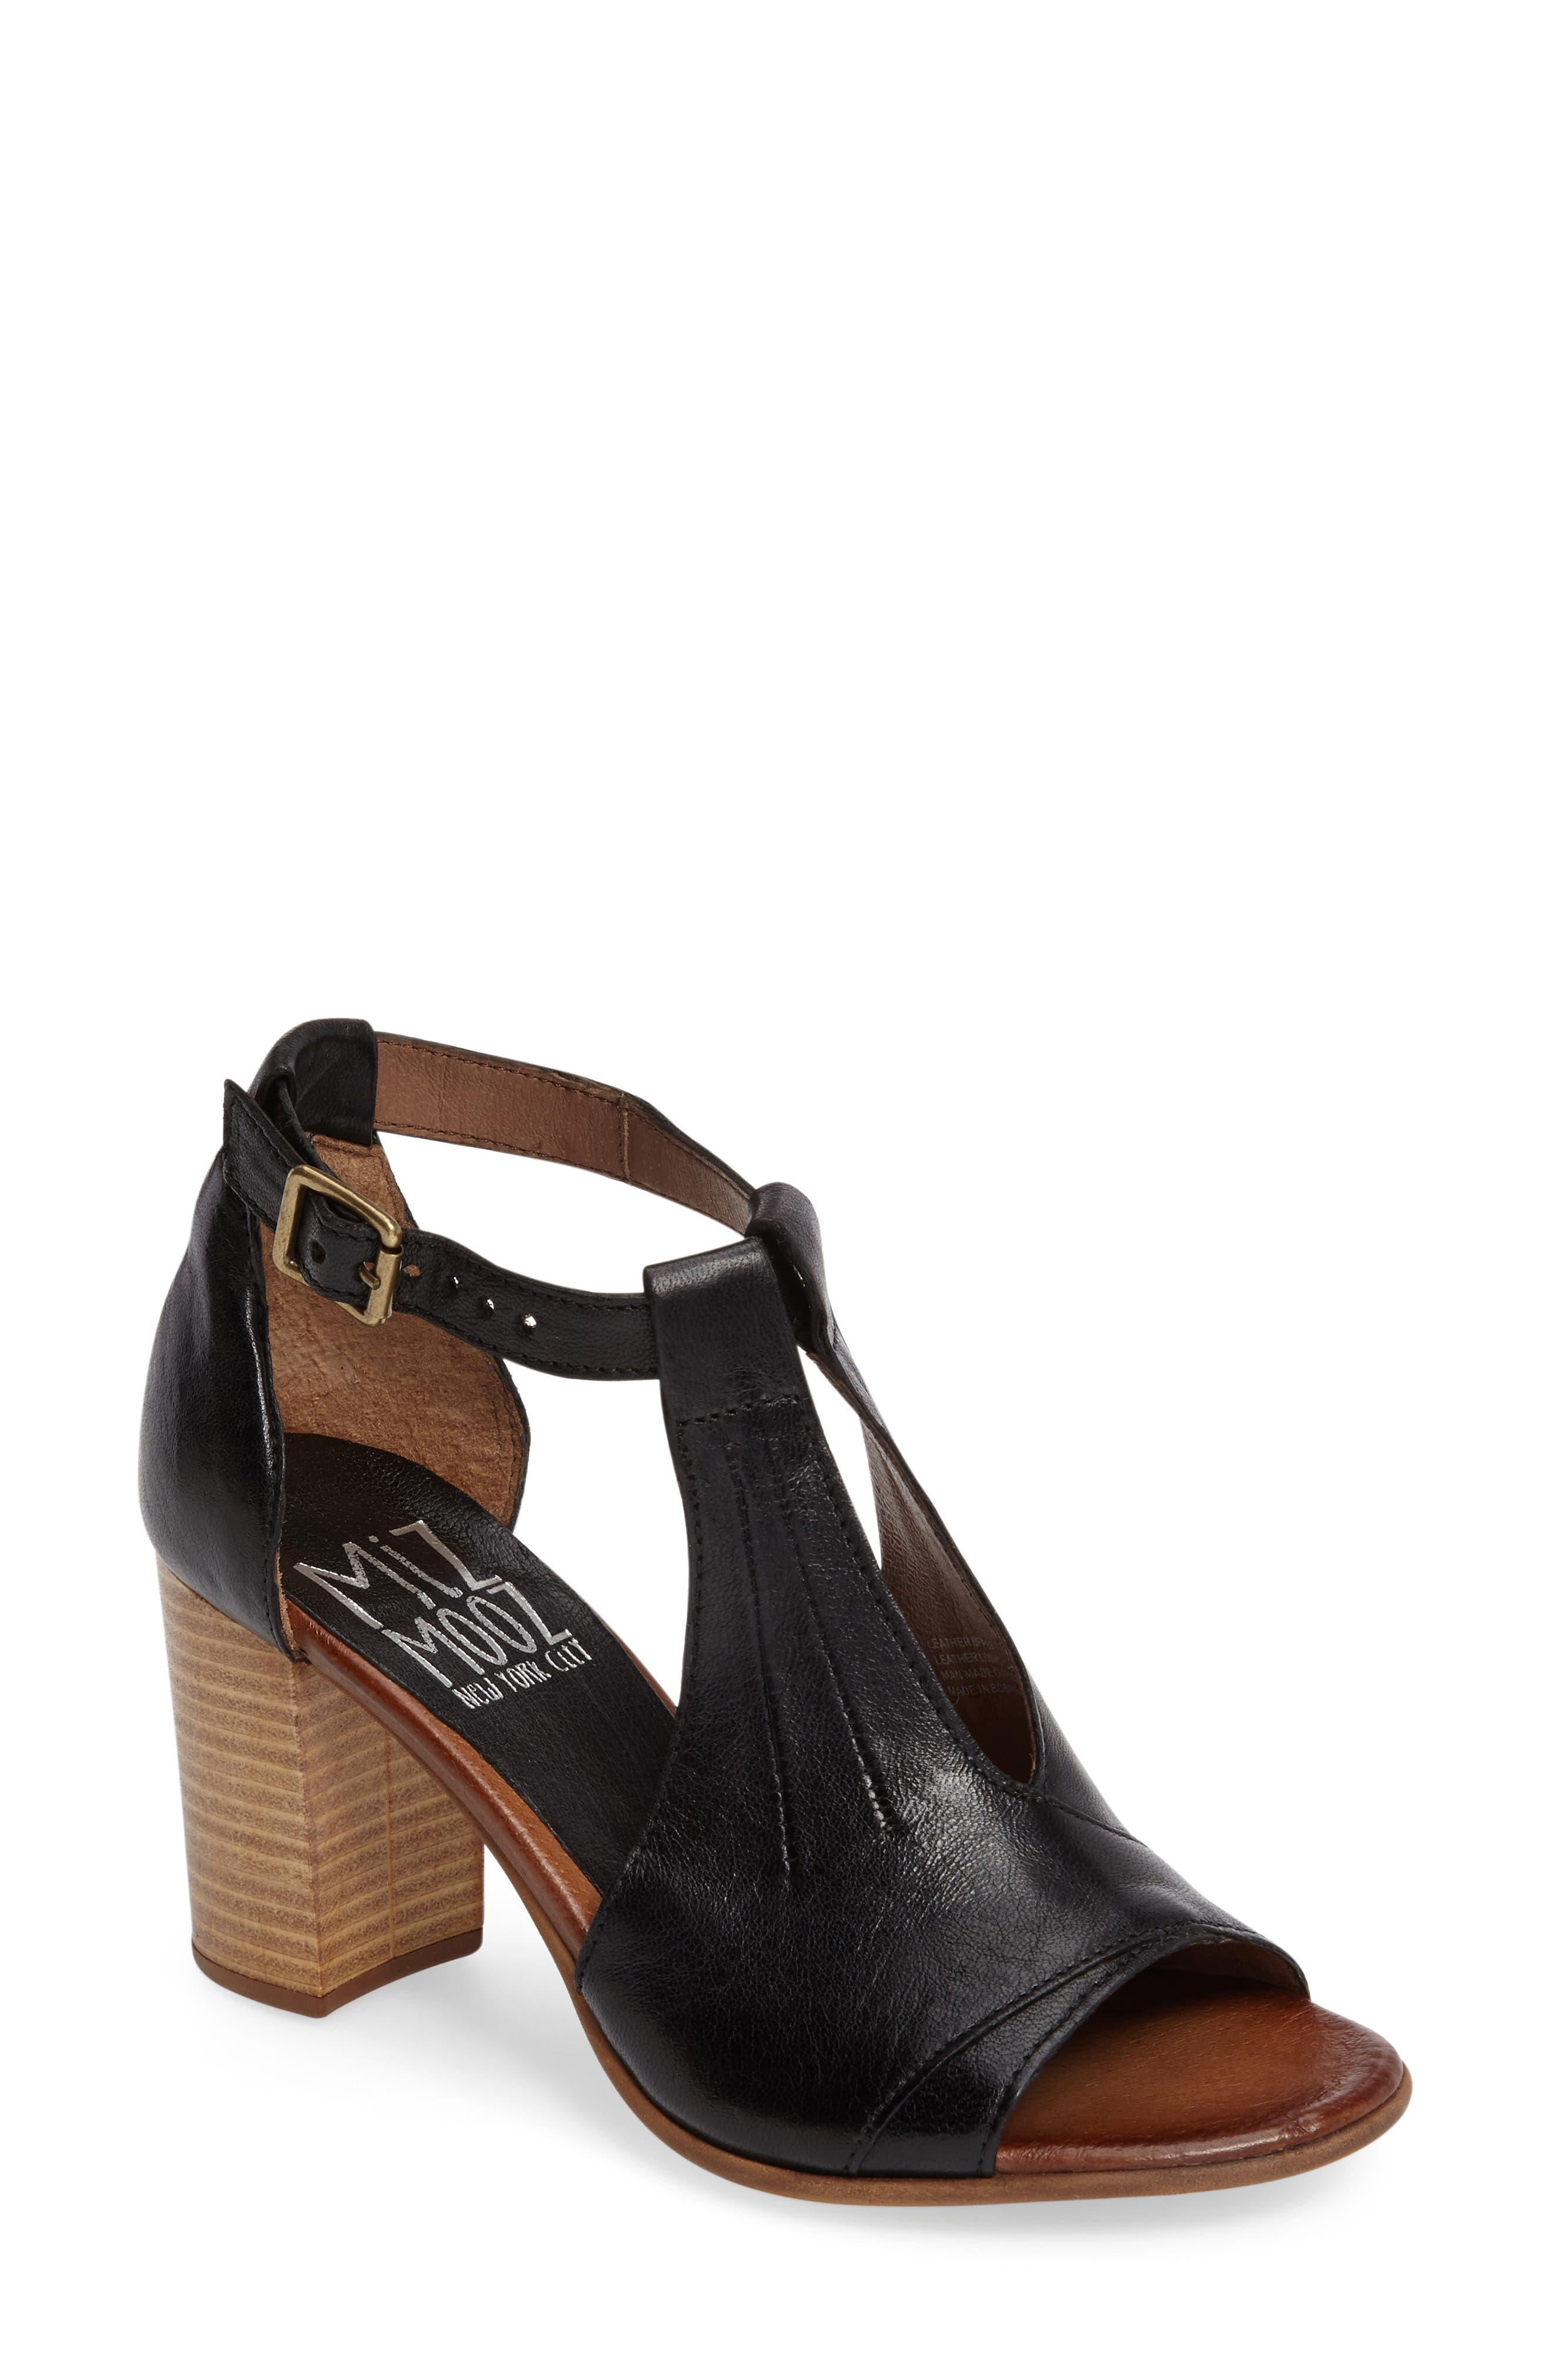 Miz Mooz Savannah T-Strap Strap Sandal (Women)